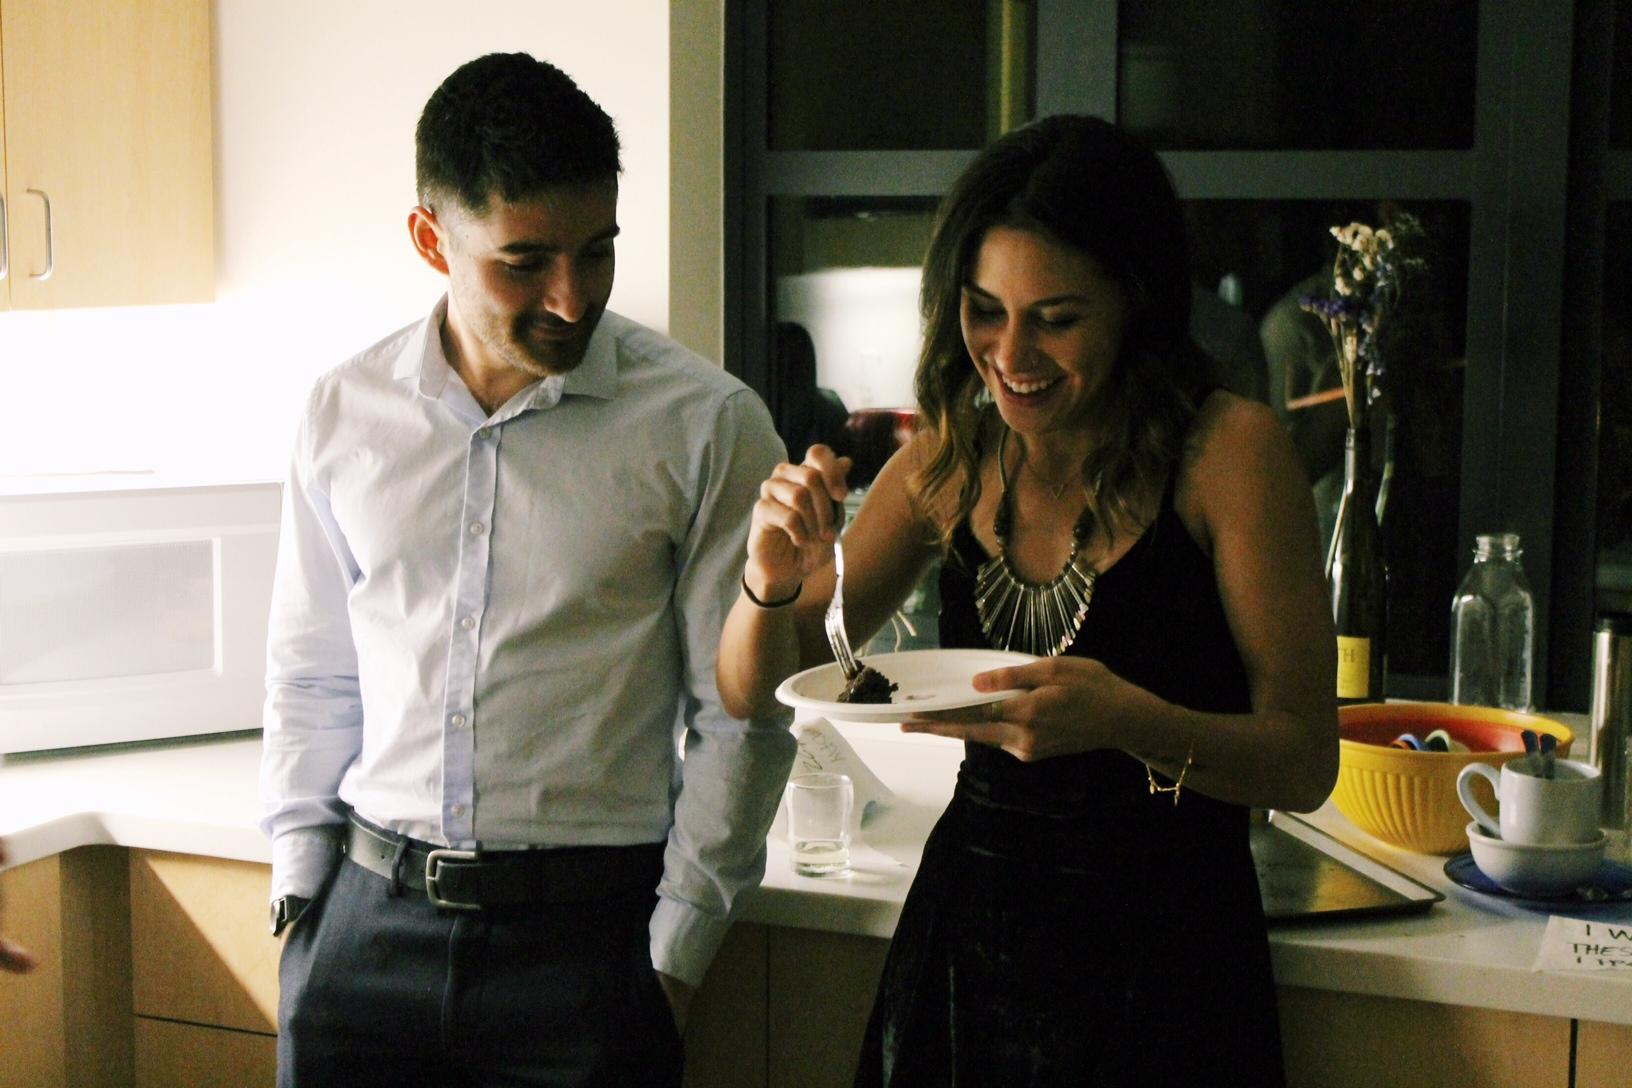 The cutest couple + cake